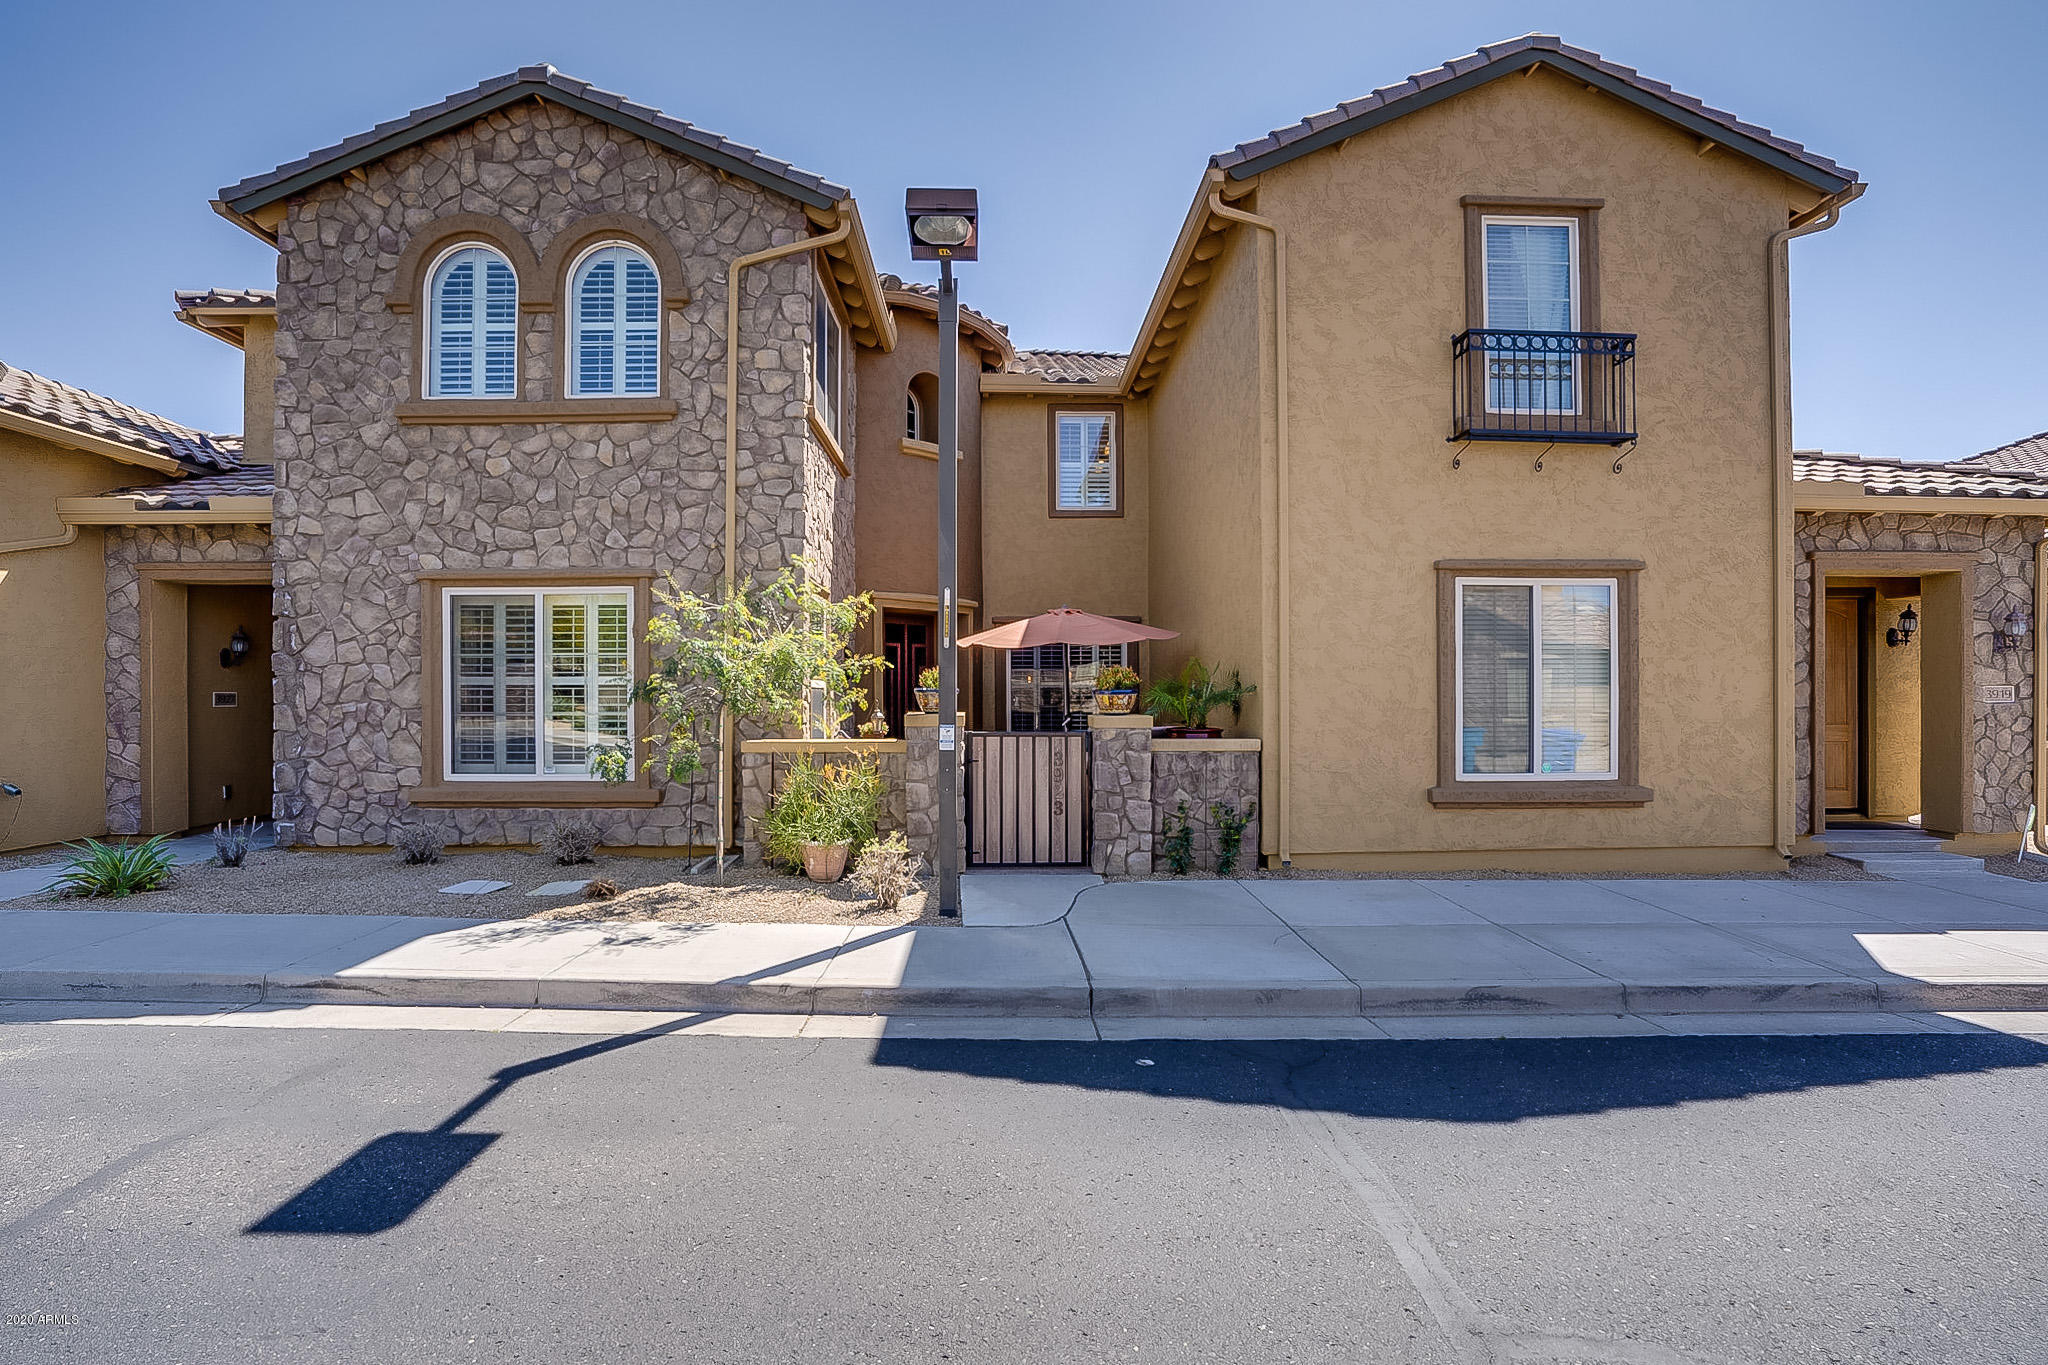 Photo of 3923 E CAT BALUE Drive, Phoenix, AZ 85050